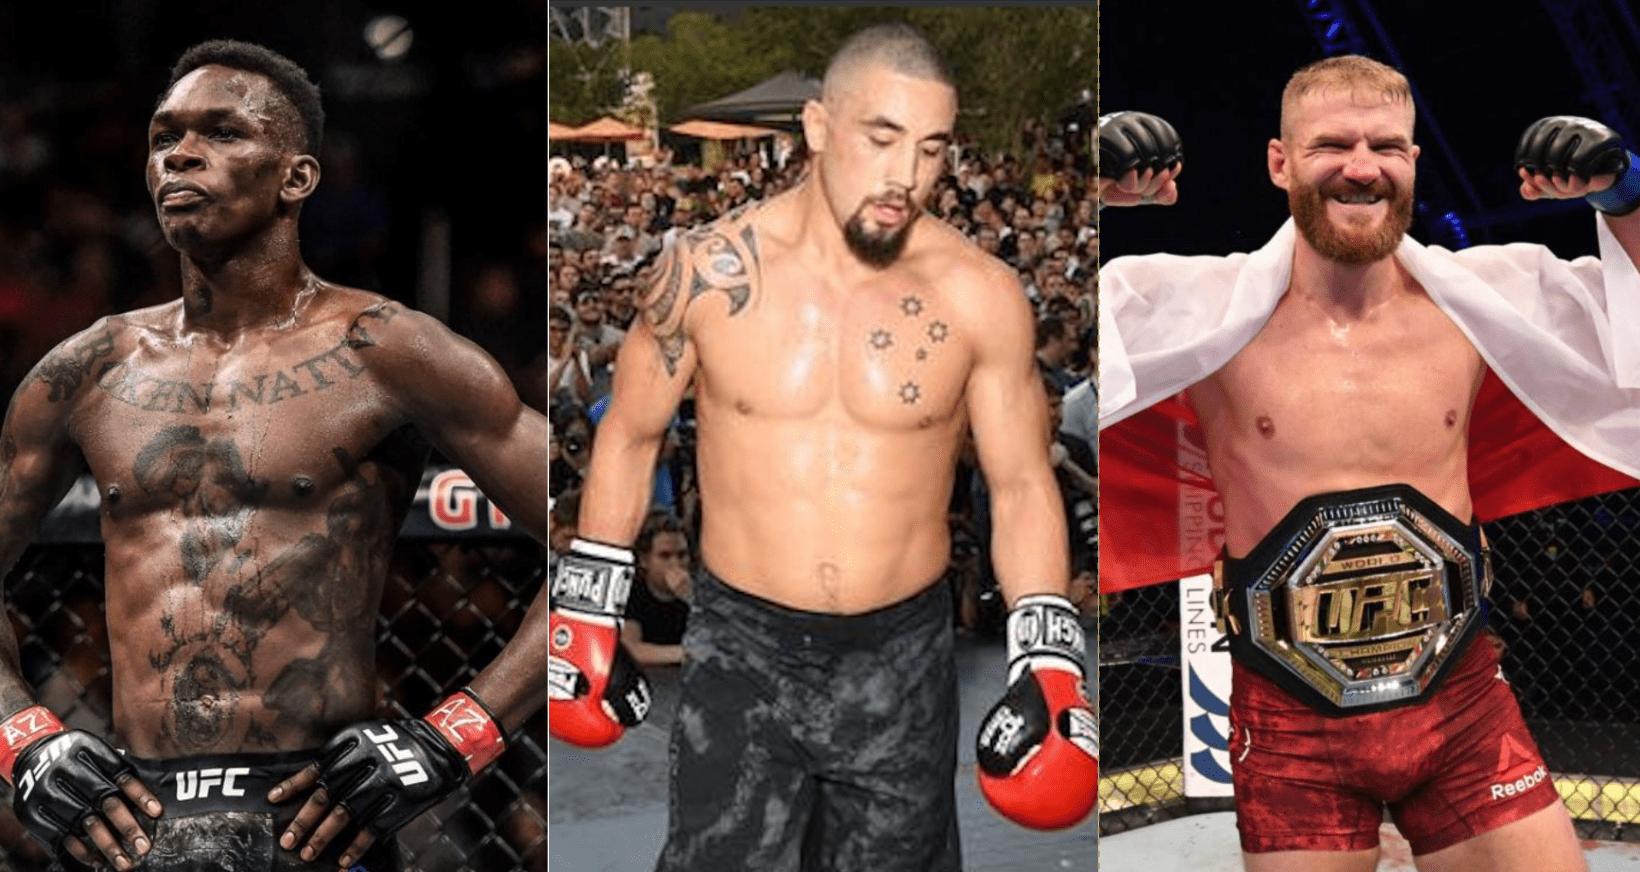 UFC: Whittaker Predicts Adesanya vs Blachowicz Outcome